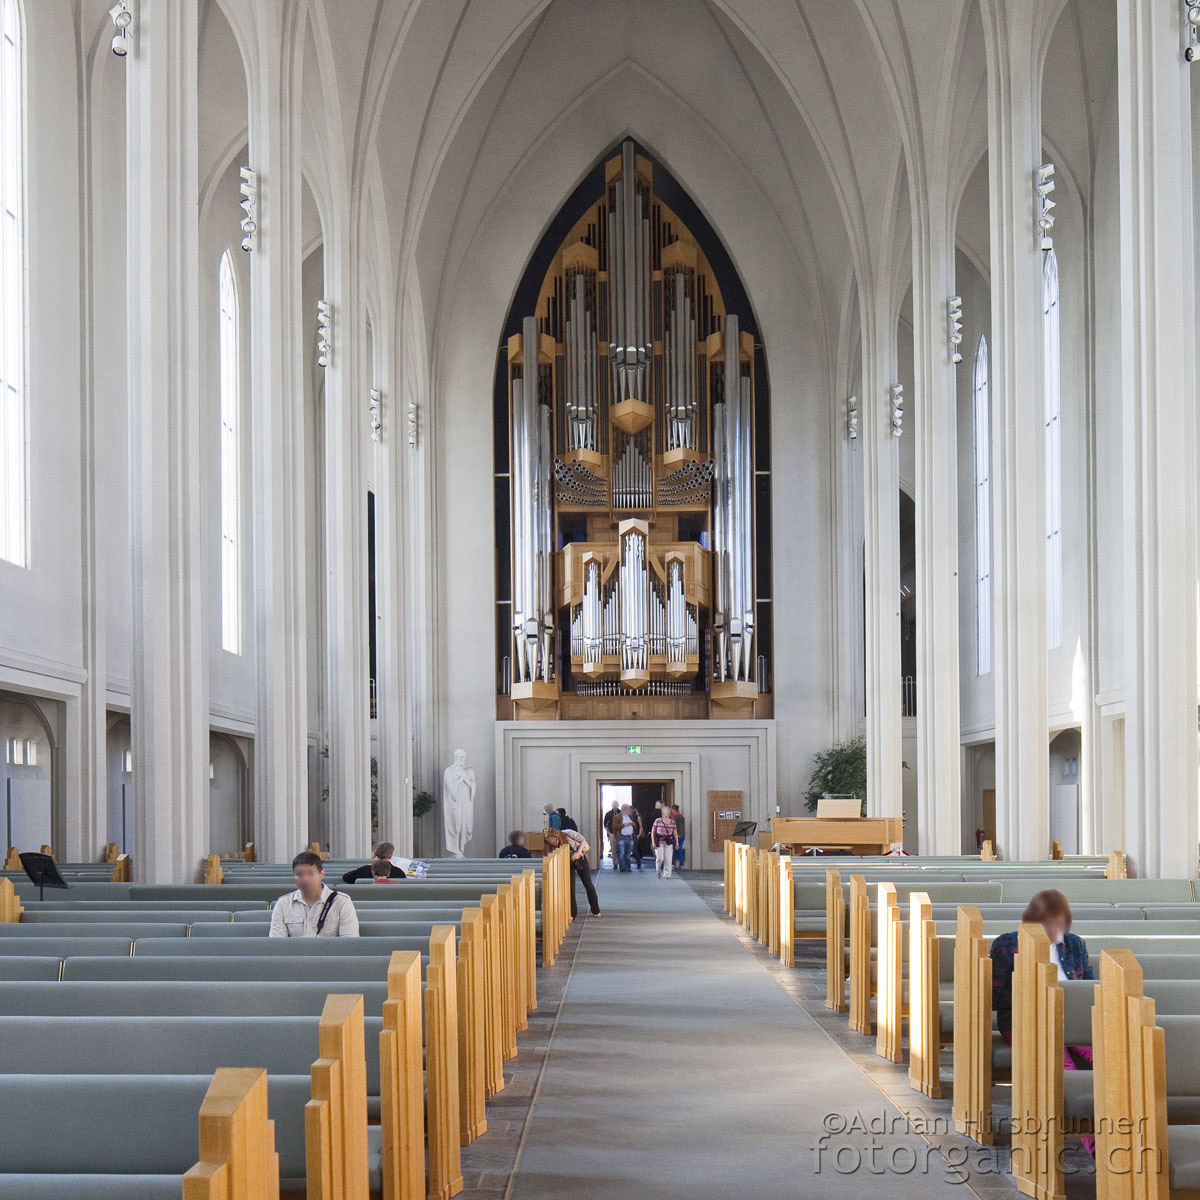 Orgel in der Hallgrimskirkja: Erinnert ebenfalls an Basaltsäulen.